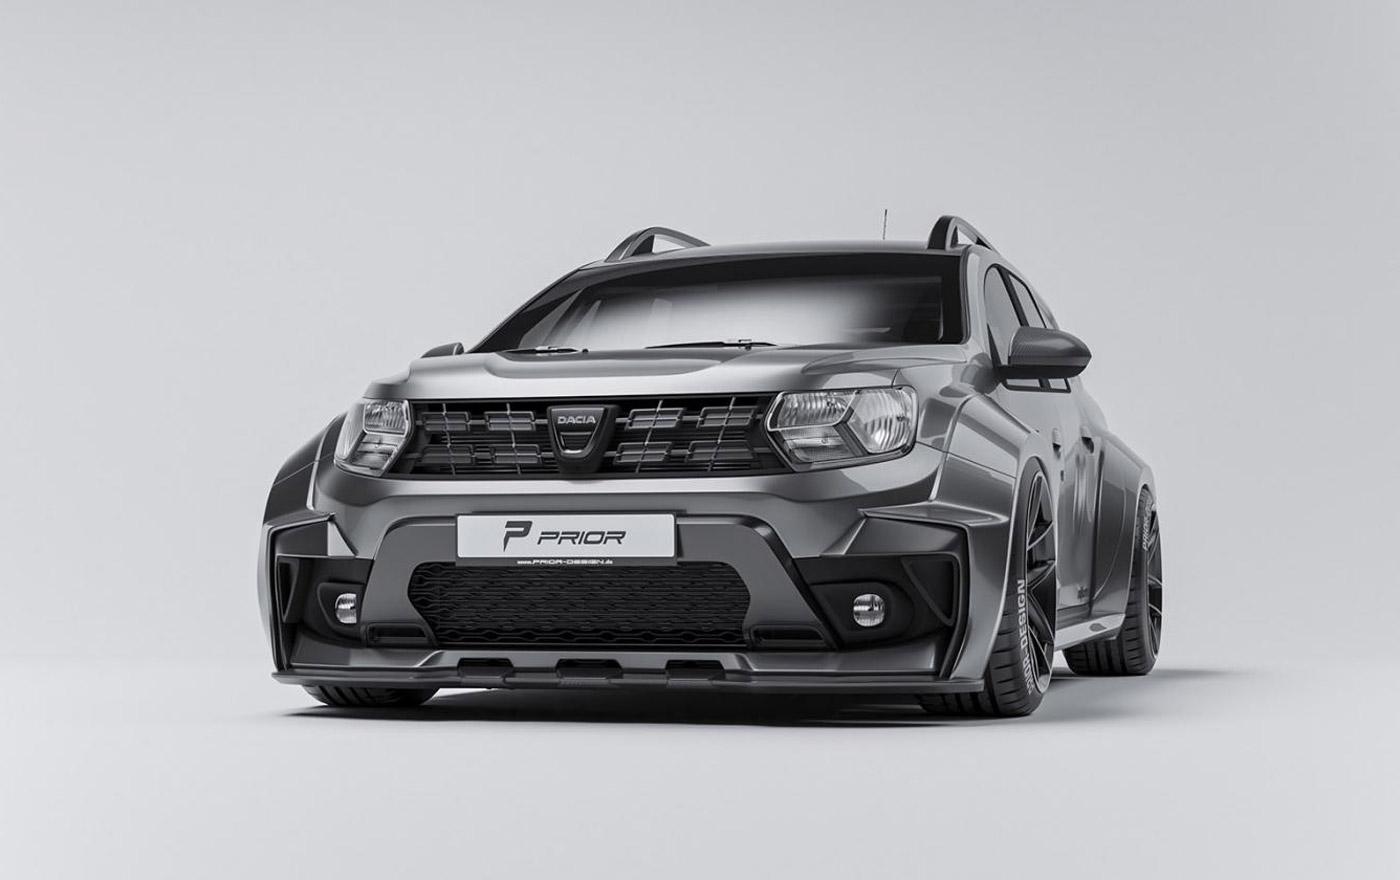 Dacia-Duster-bodykit-by-Prior-Design-2